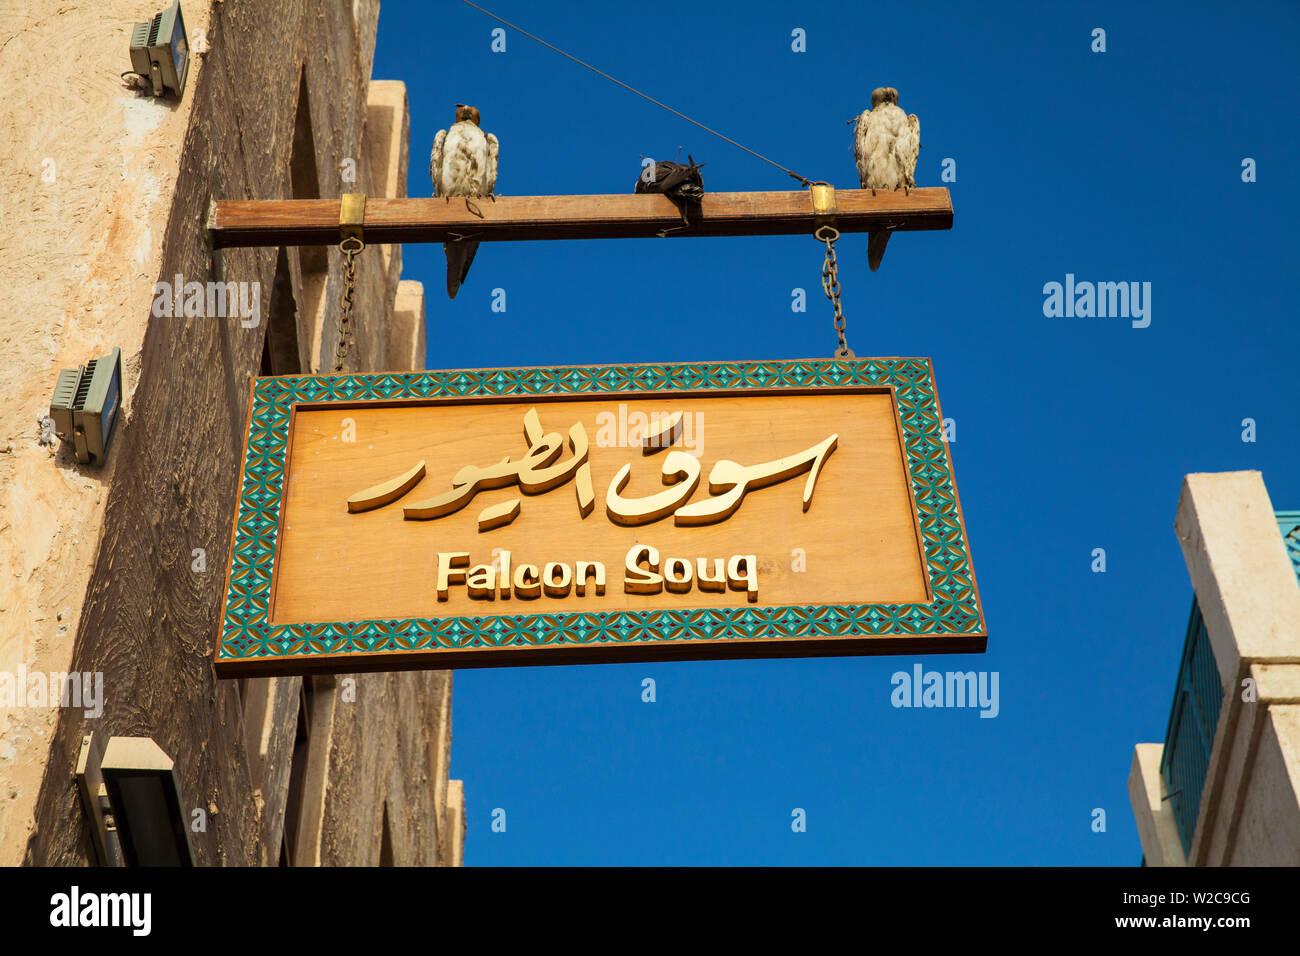 Falcon Souq Stock Photos & Falcon Souq Stock Images - Alamy